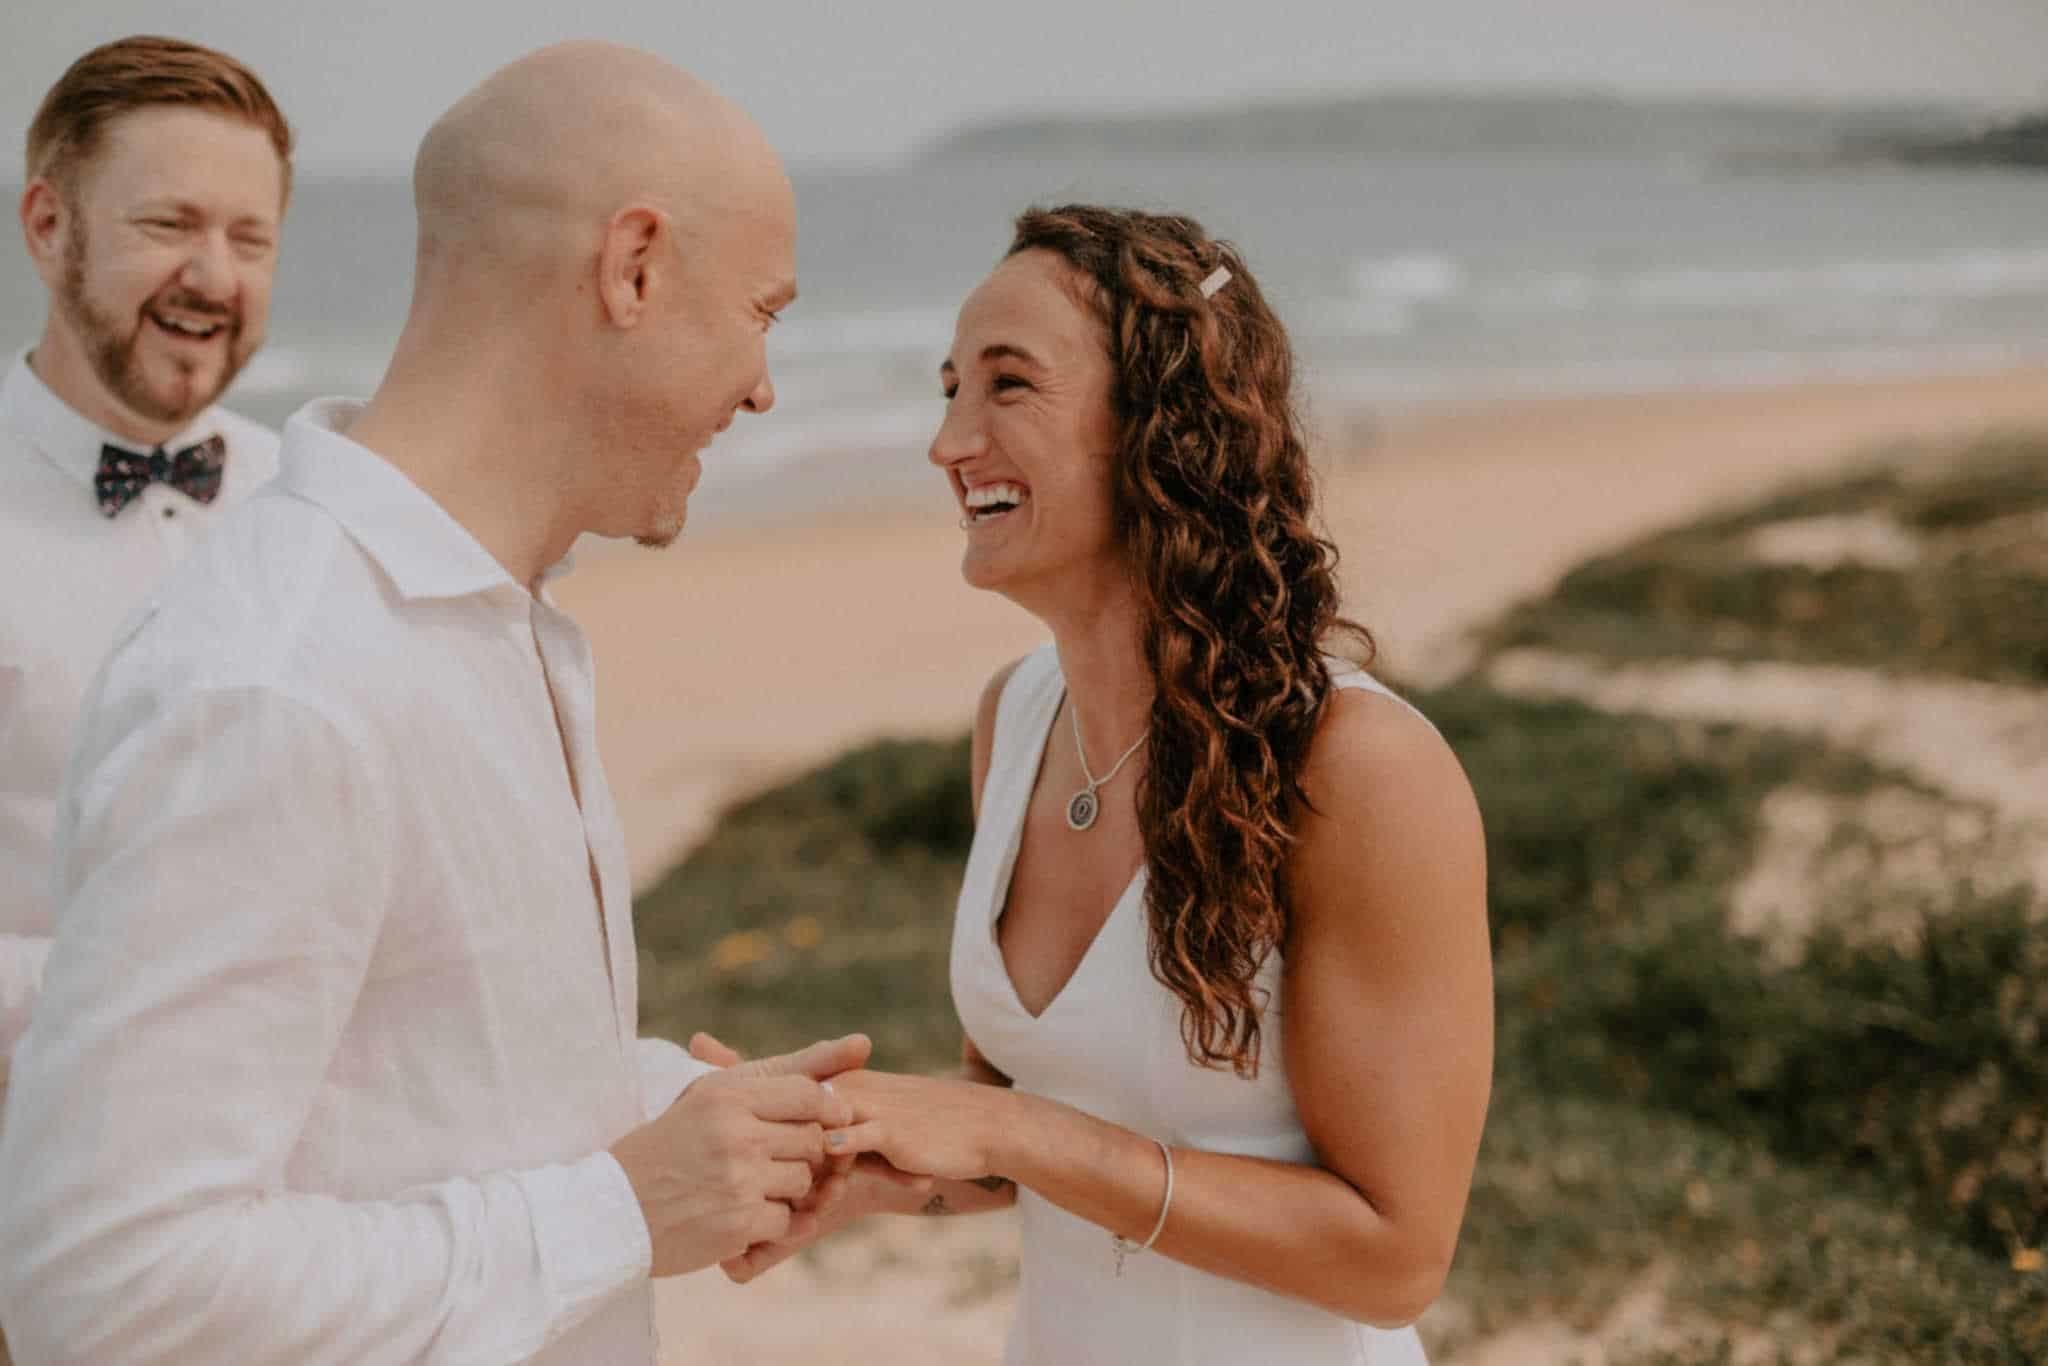 Northern Beaches Wedding - Stephen Lee Sydney Marriage Celebrant